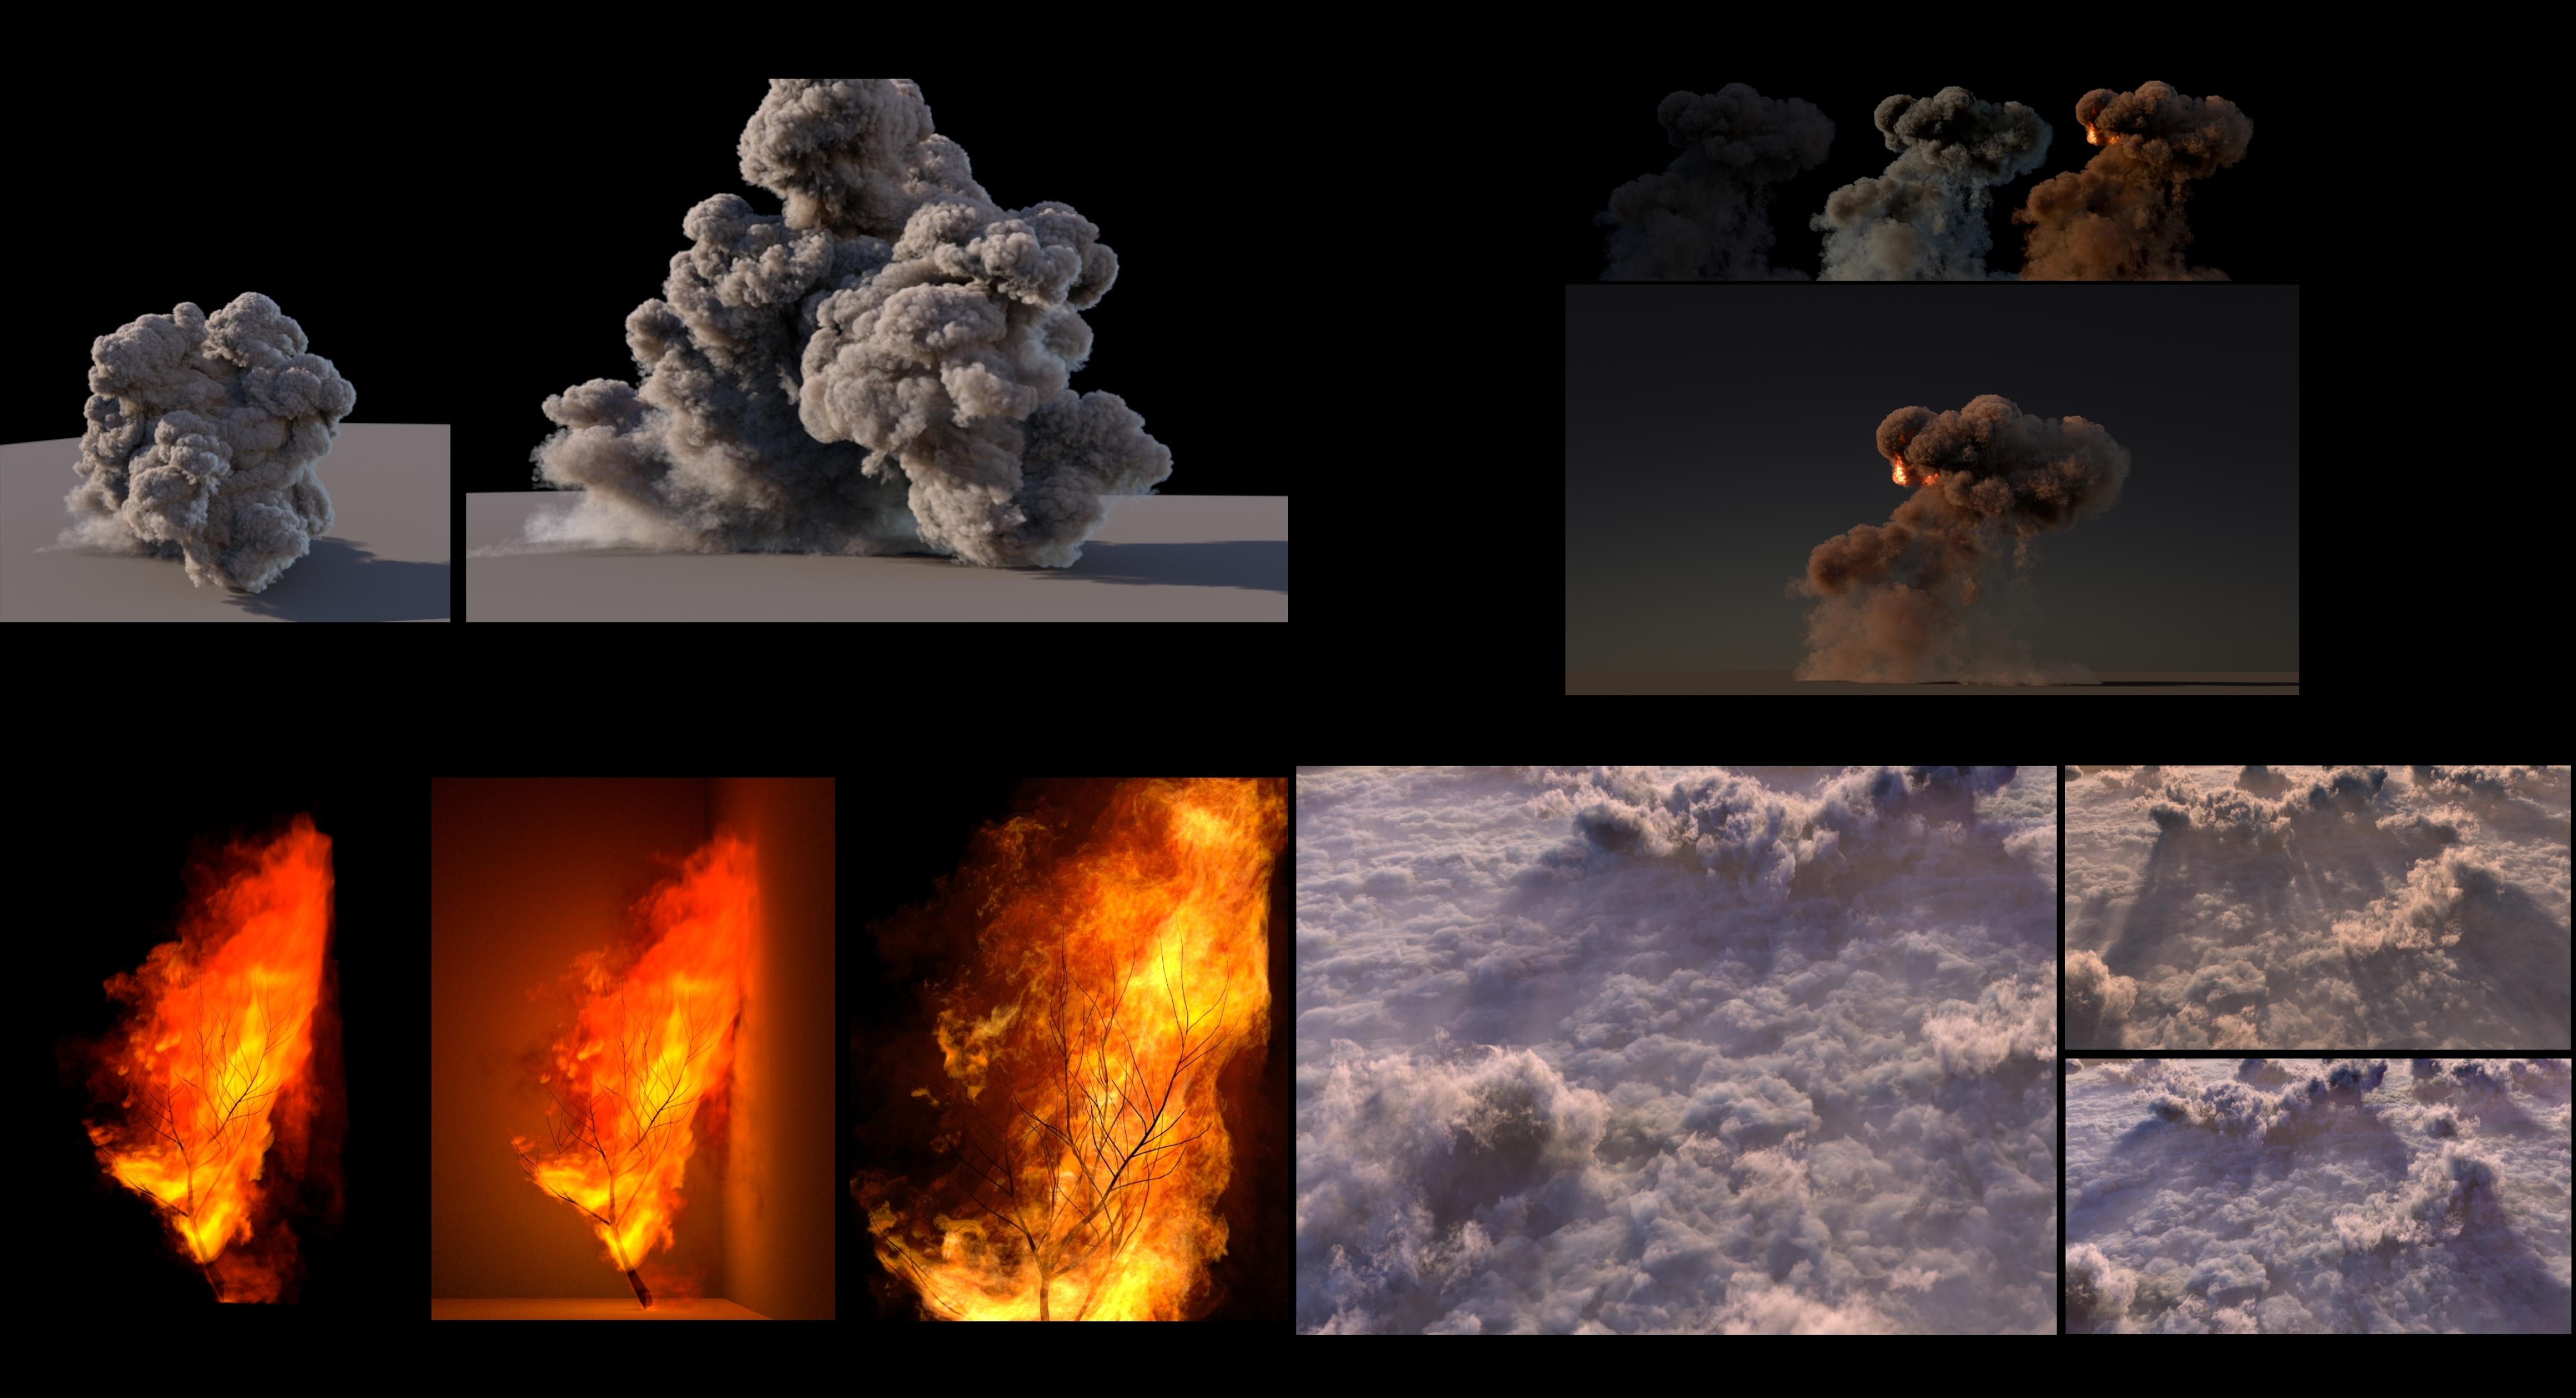 Volume rendering using houdini & arnold